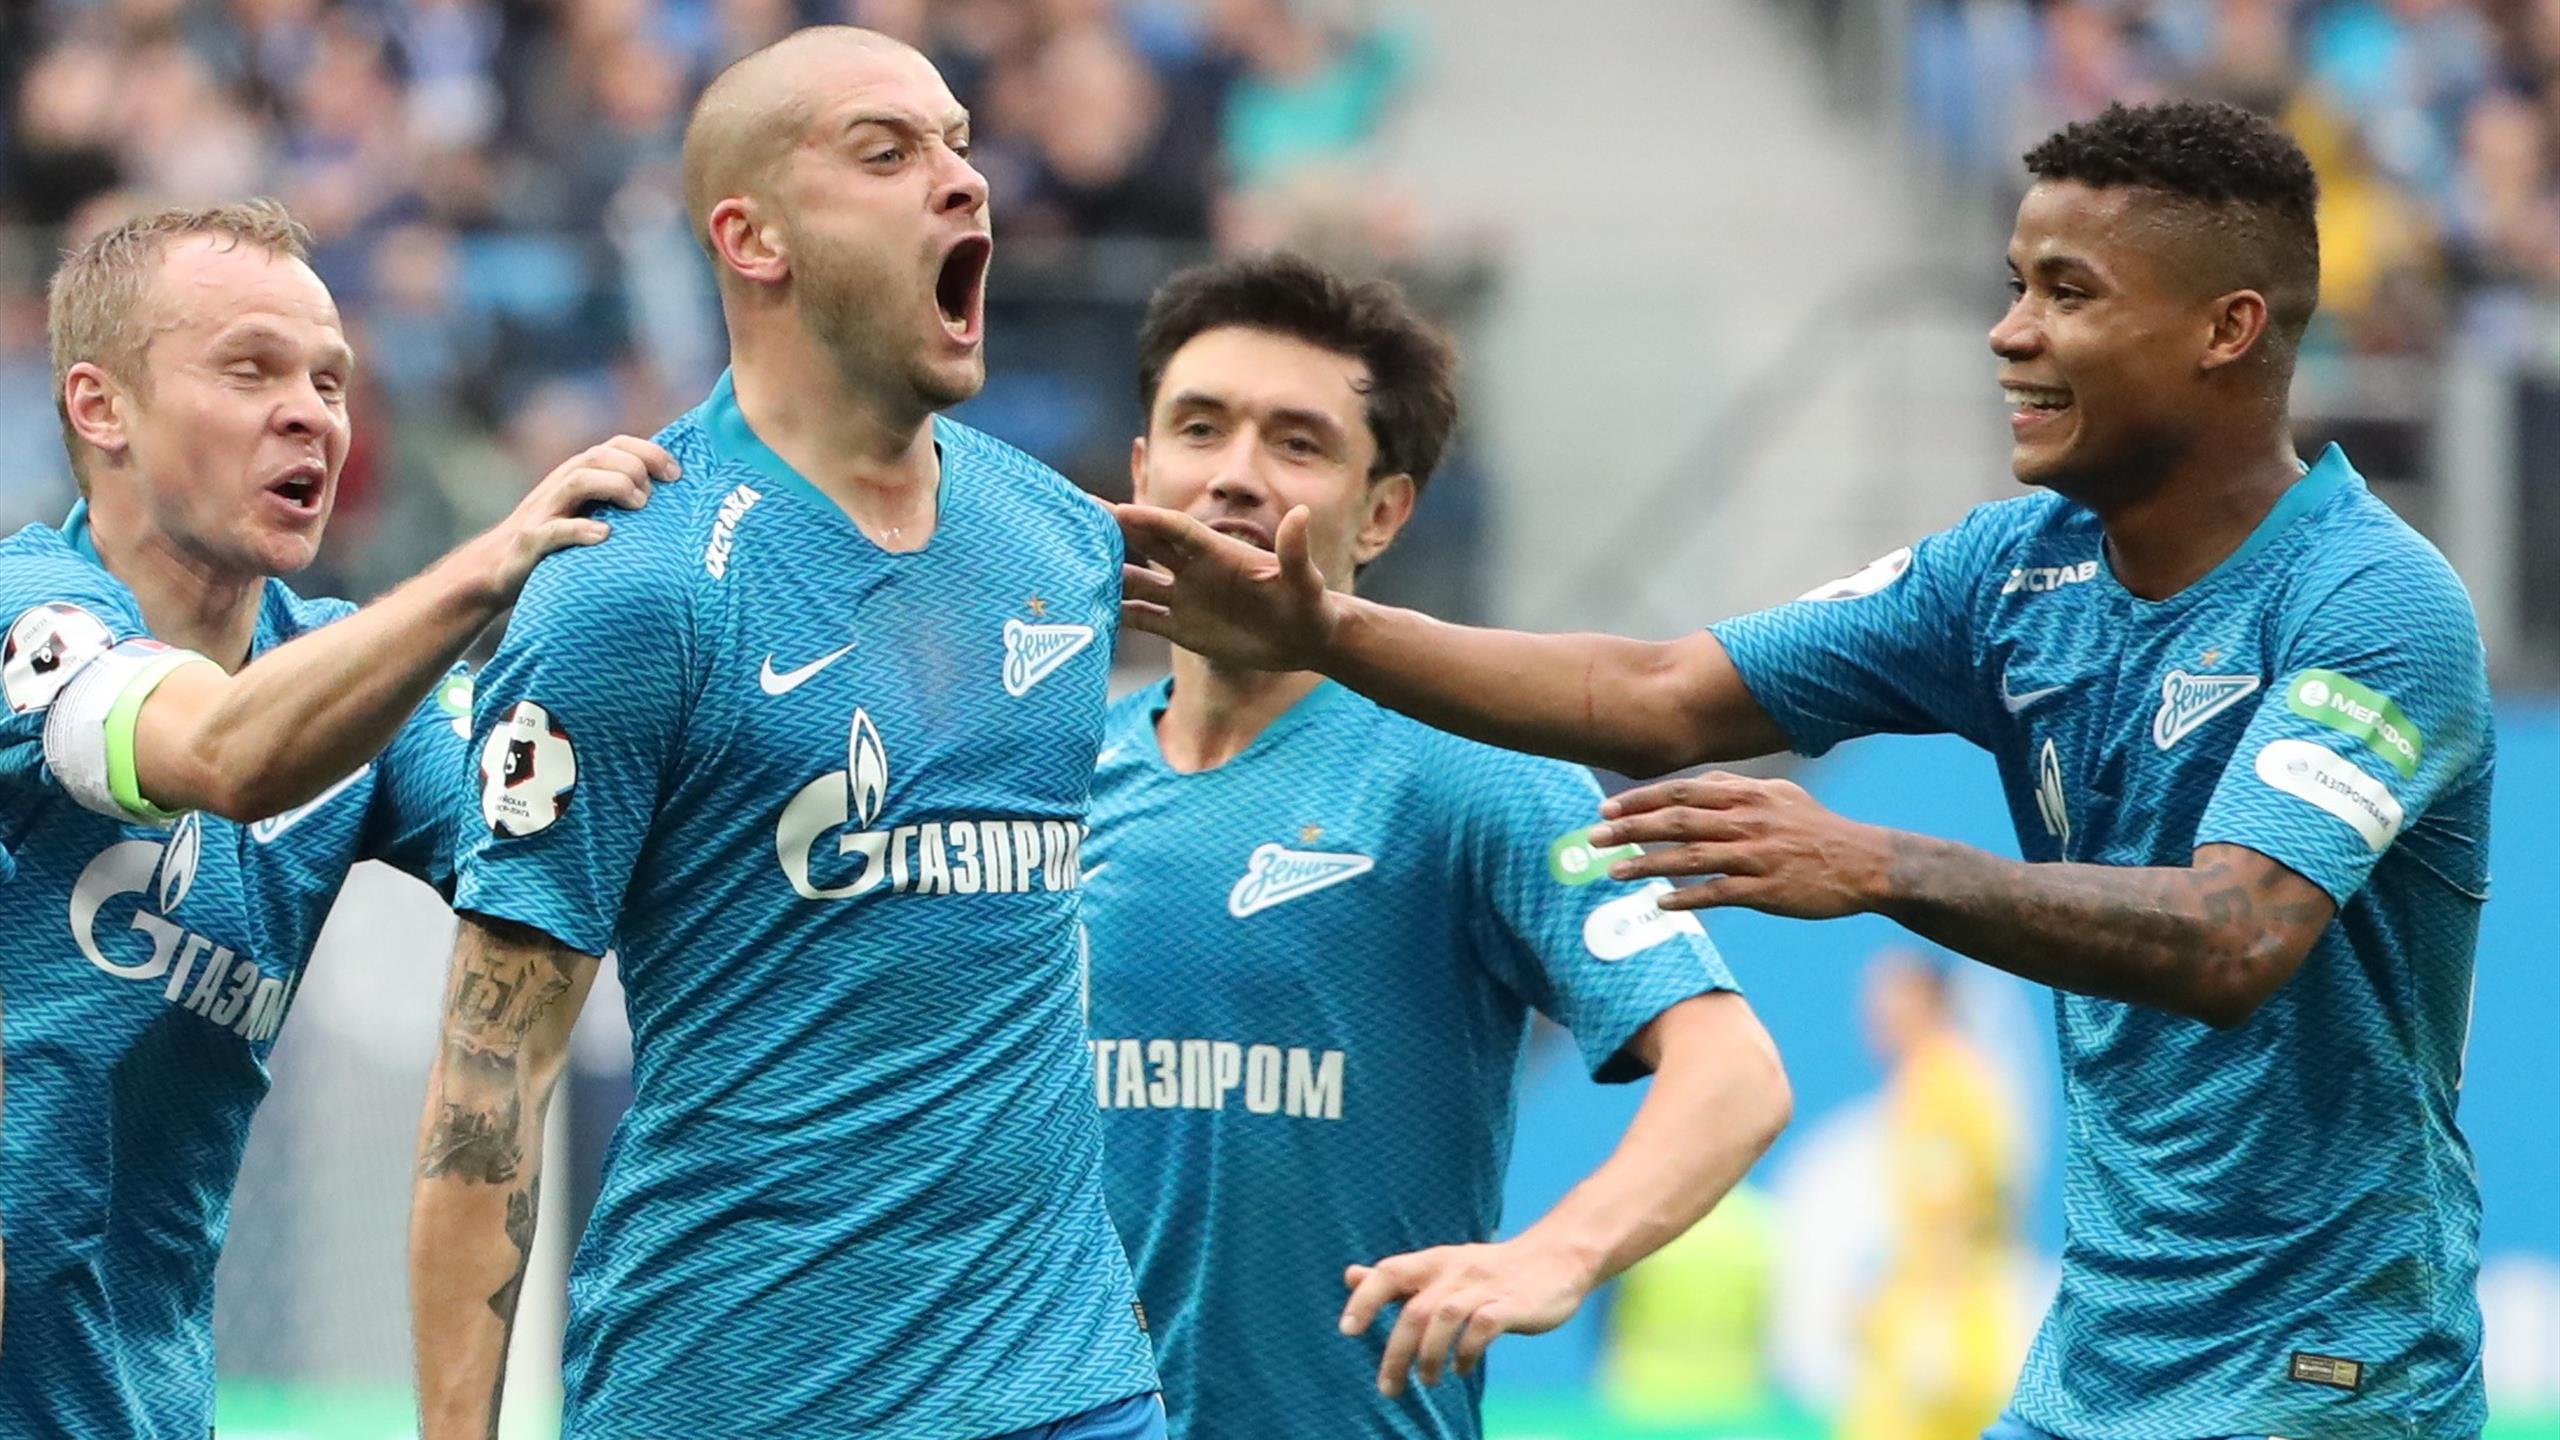 Составы команд зенит боруссия